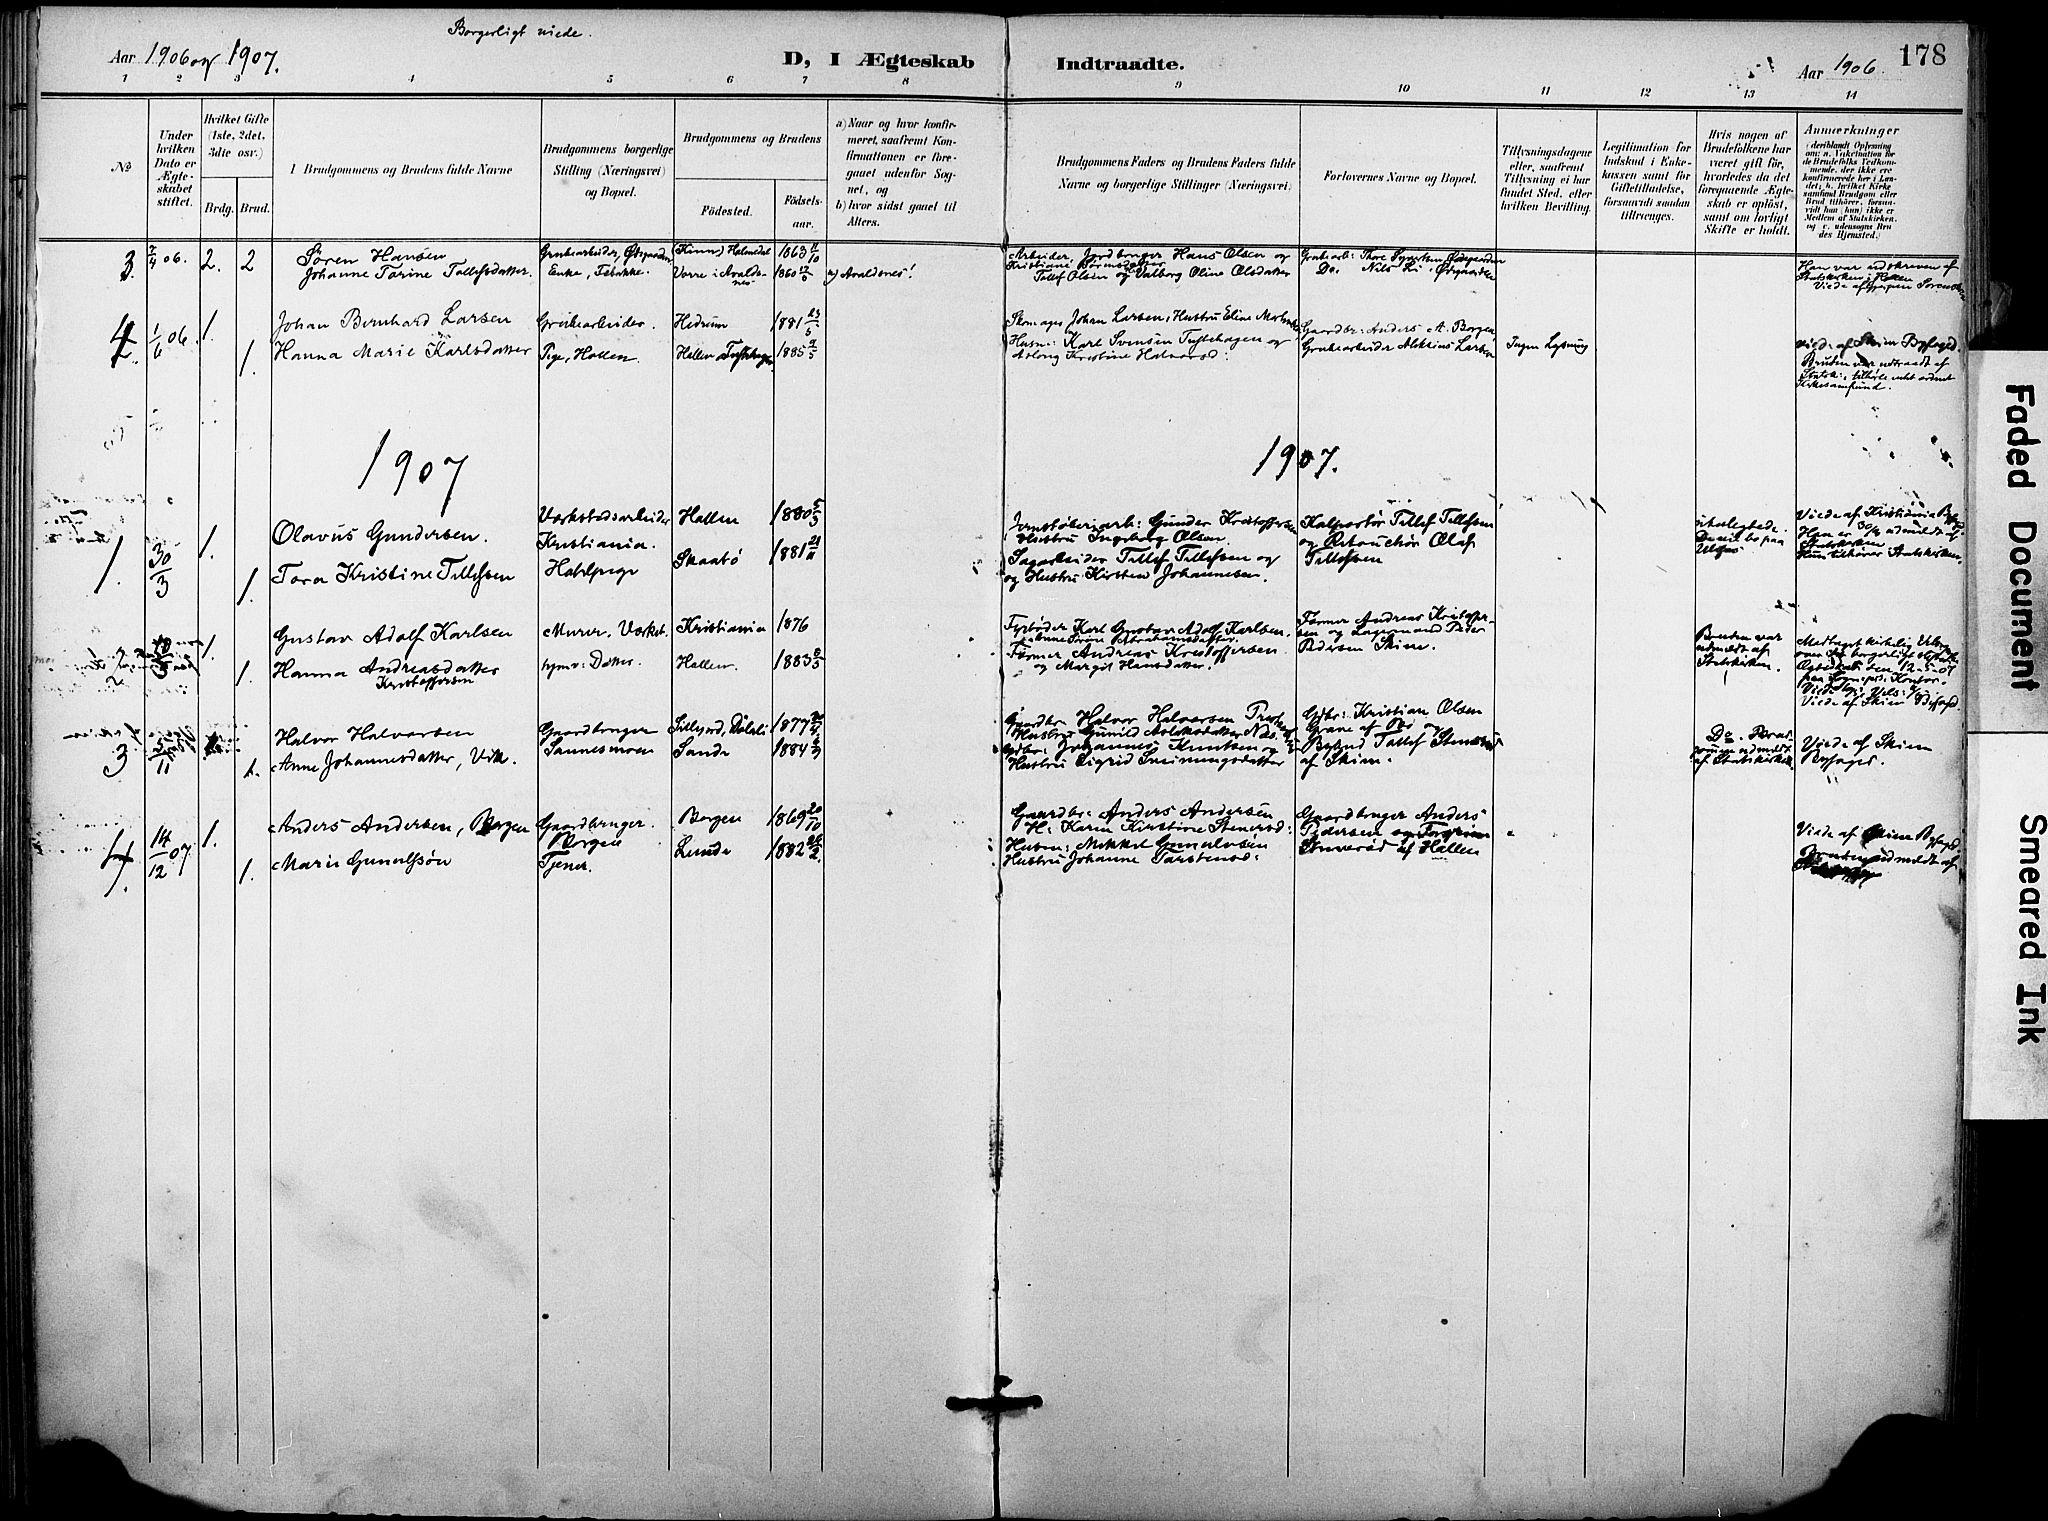 SAKO, Holla kirkebøker, F/Fa/L0010: Ministerialbok nr. 10, 1897-1907, s. 178